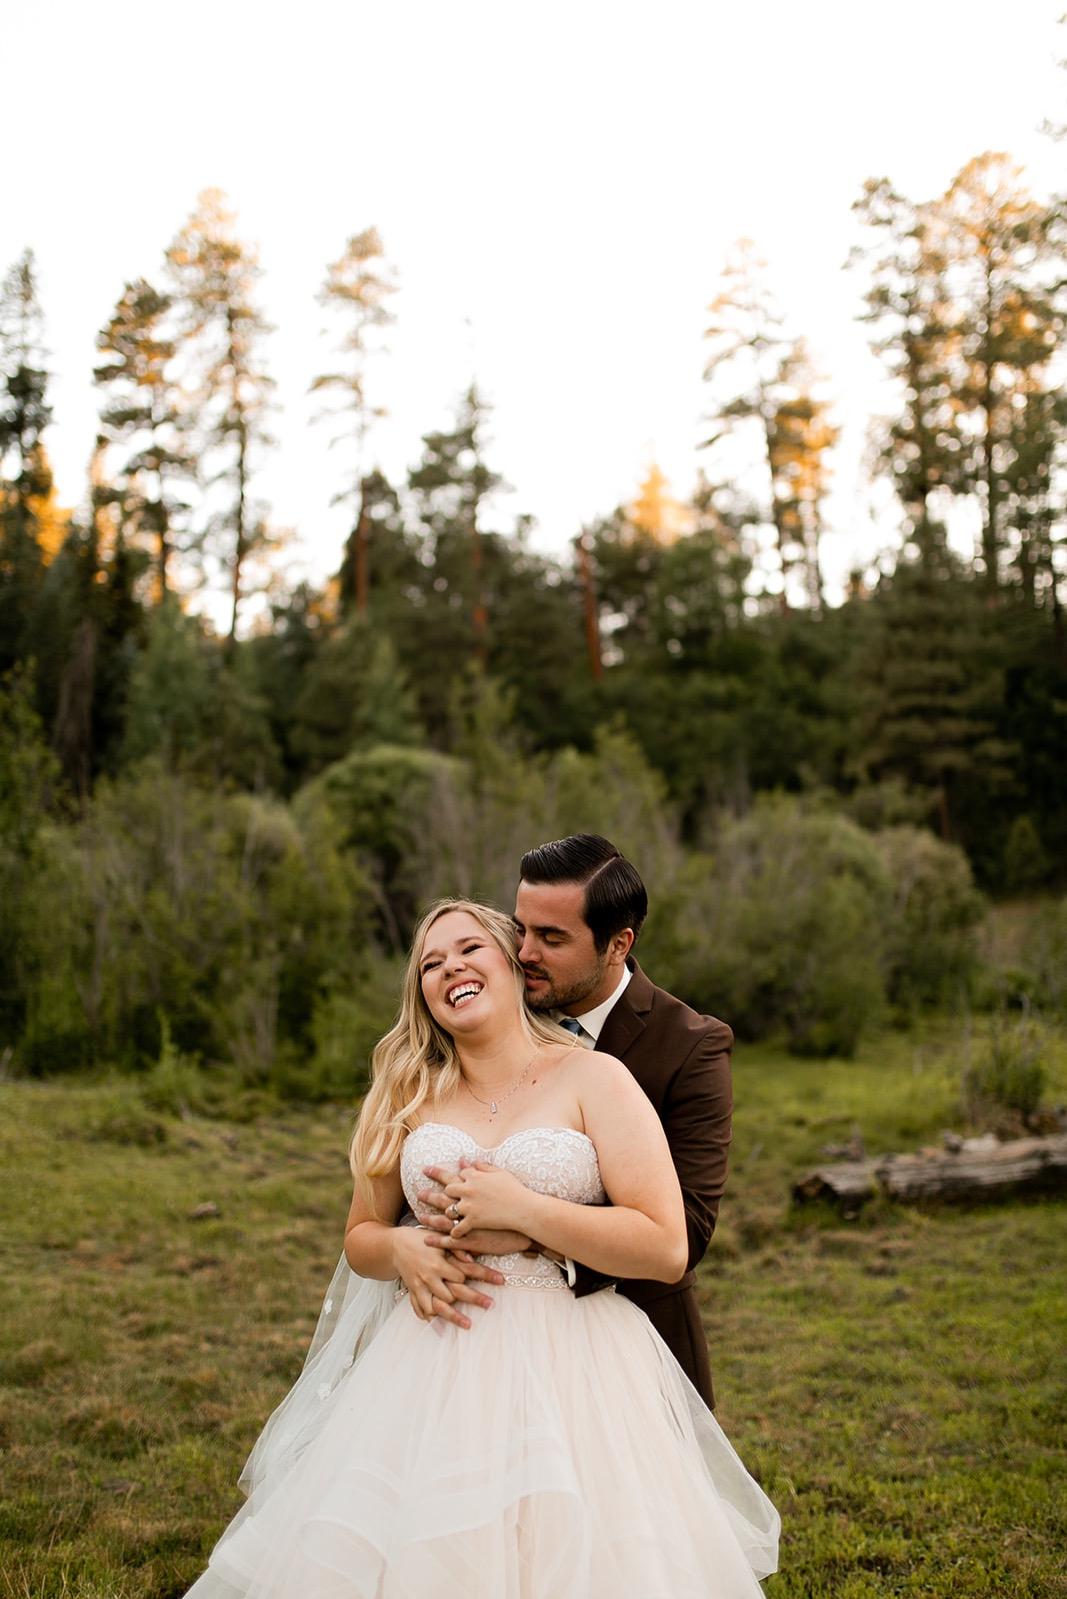 Arizona Elopement and Wedding Photographer